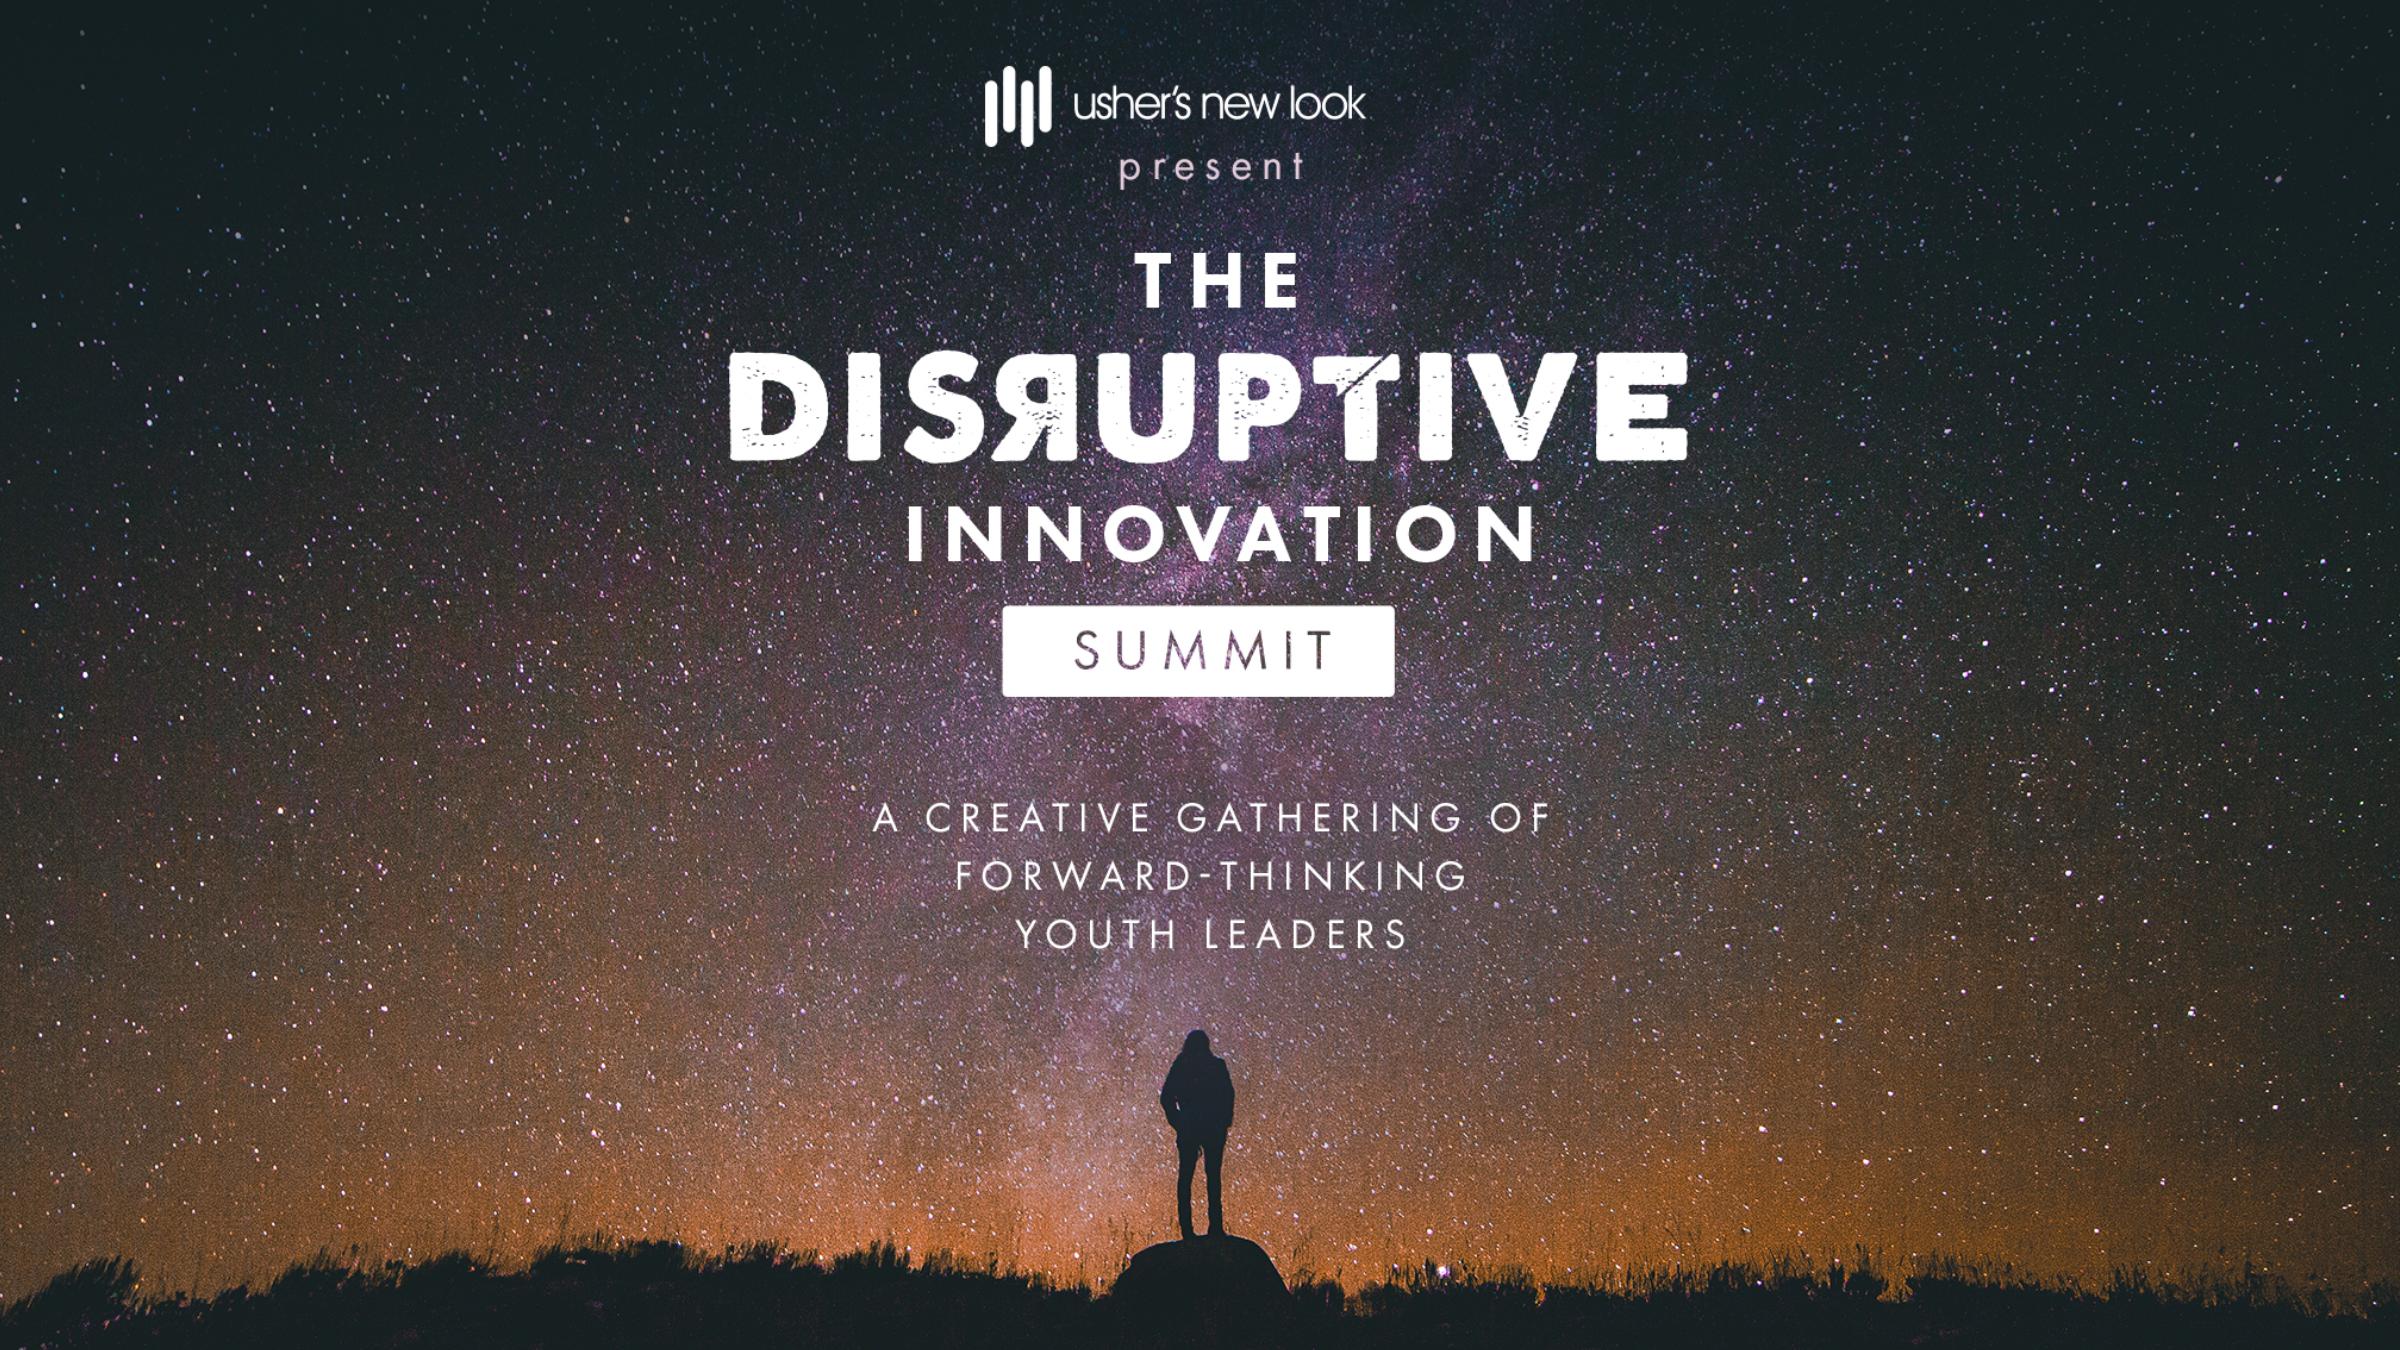 The Disruptive Innovation Summit Booklet - Created program booklet for The Disruptive Innovation Youth Summit